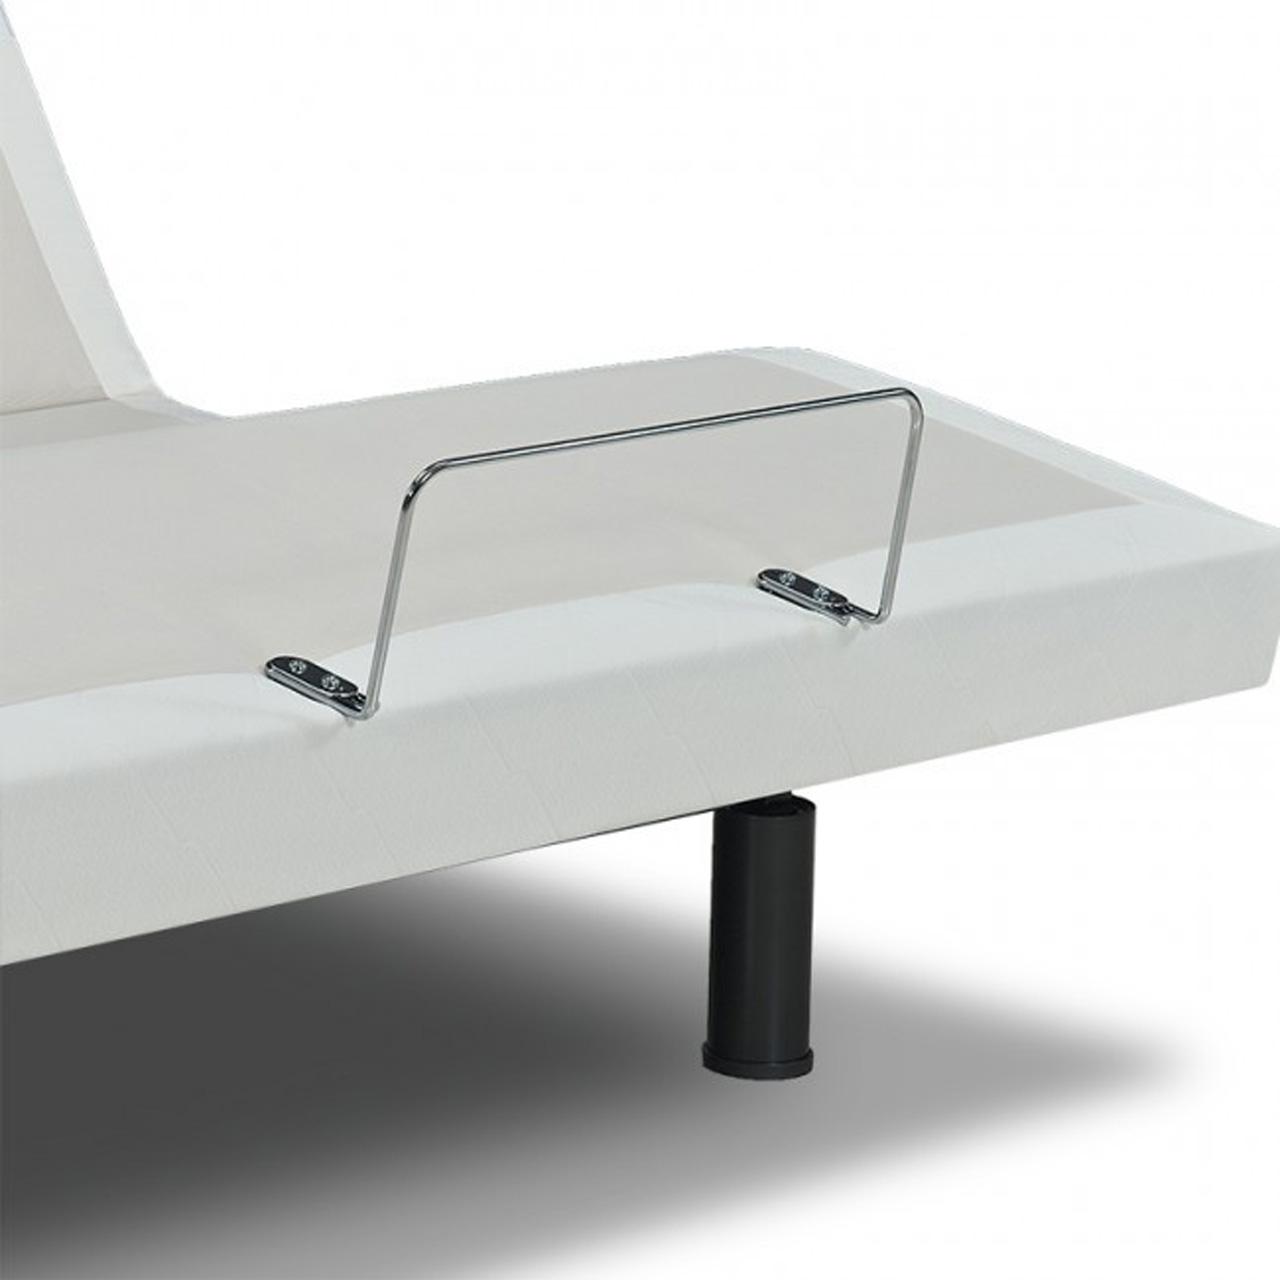 Adjustable Bed Mattress Retainer Pro Sealy Reflexion Reverie 8q Adjustable Base Reverie